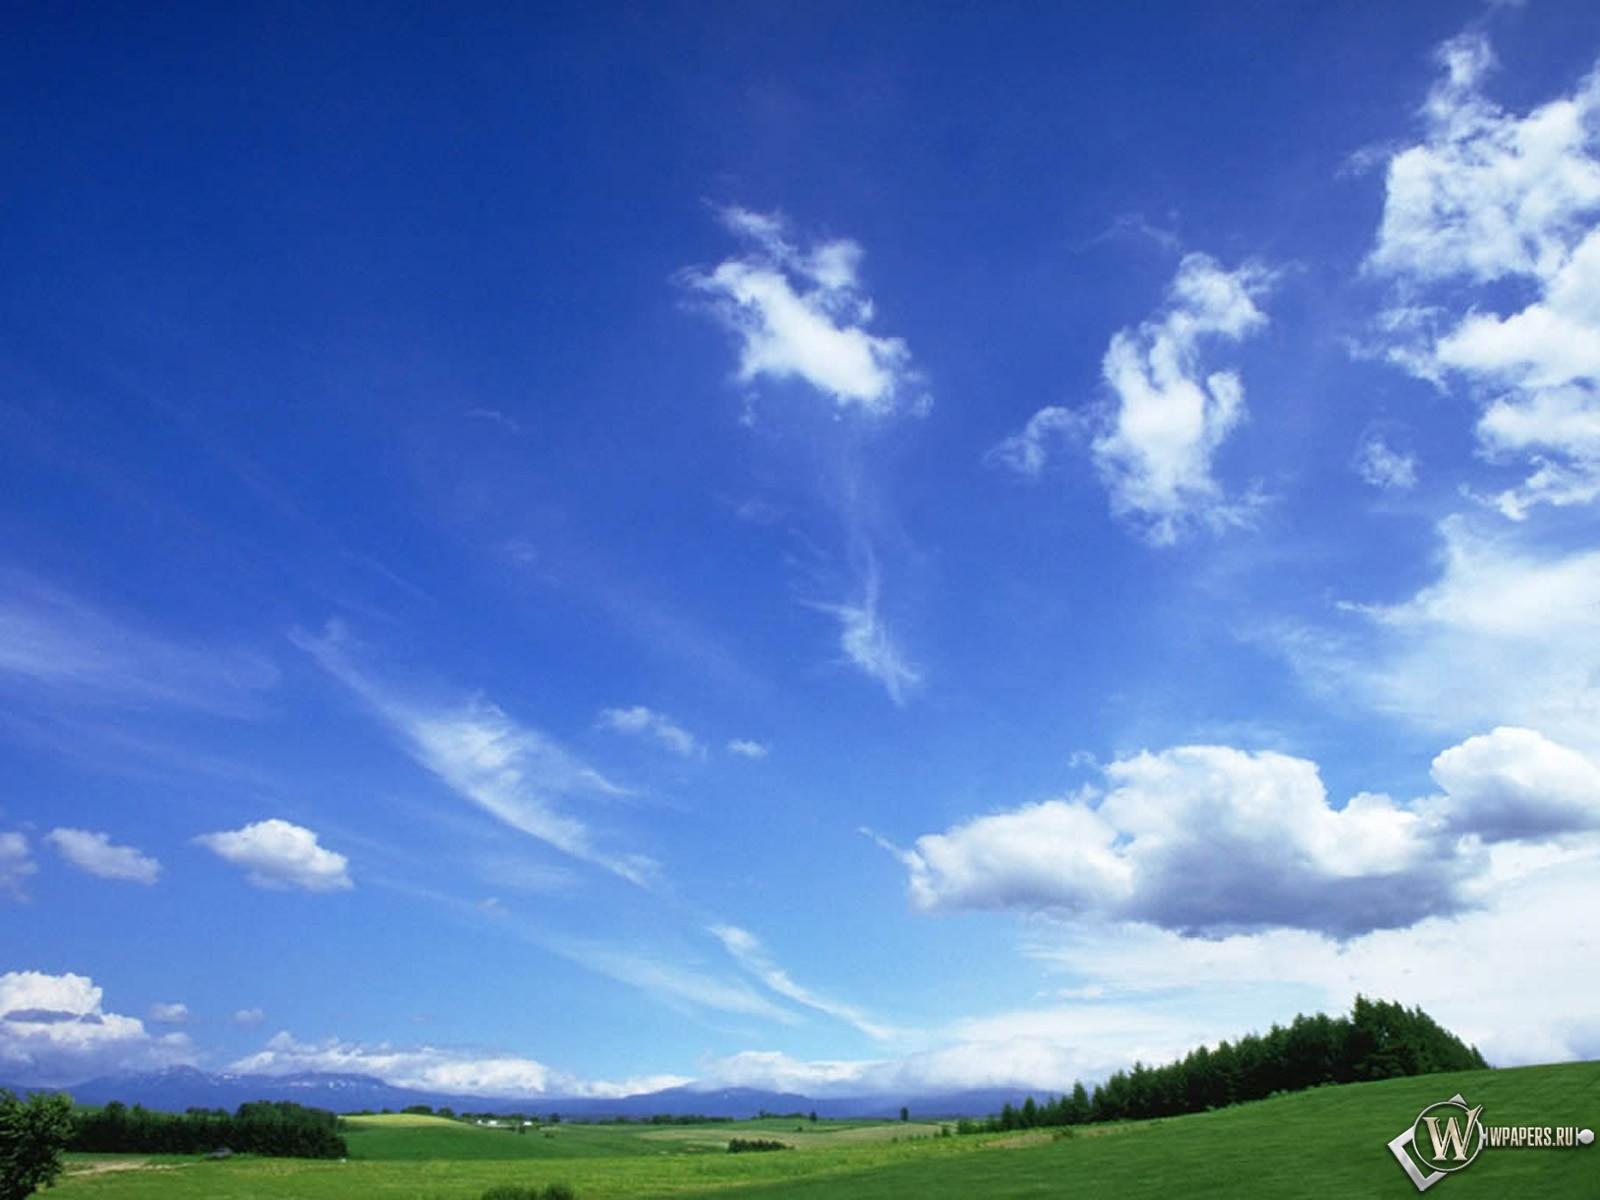 Небо над лужайкой 1600x1200